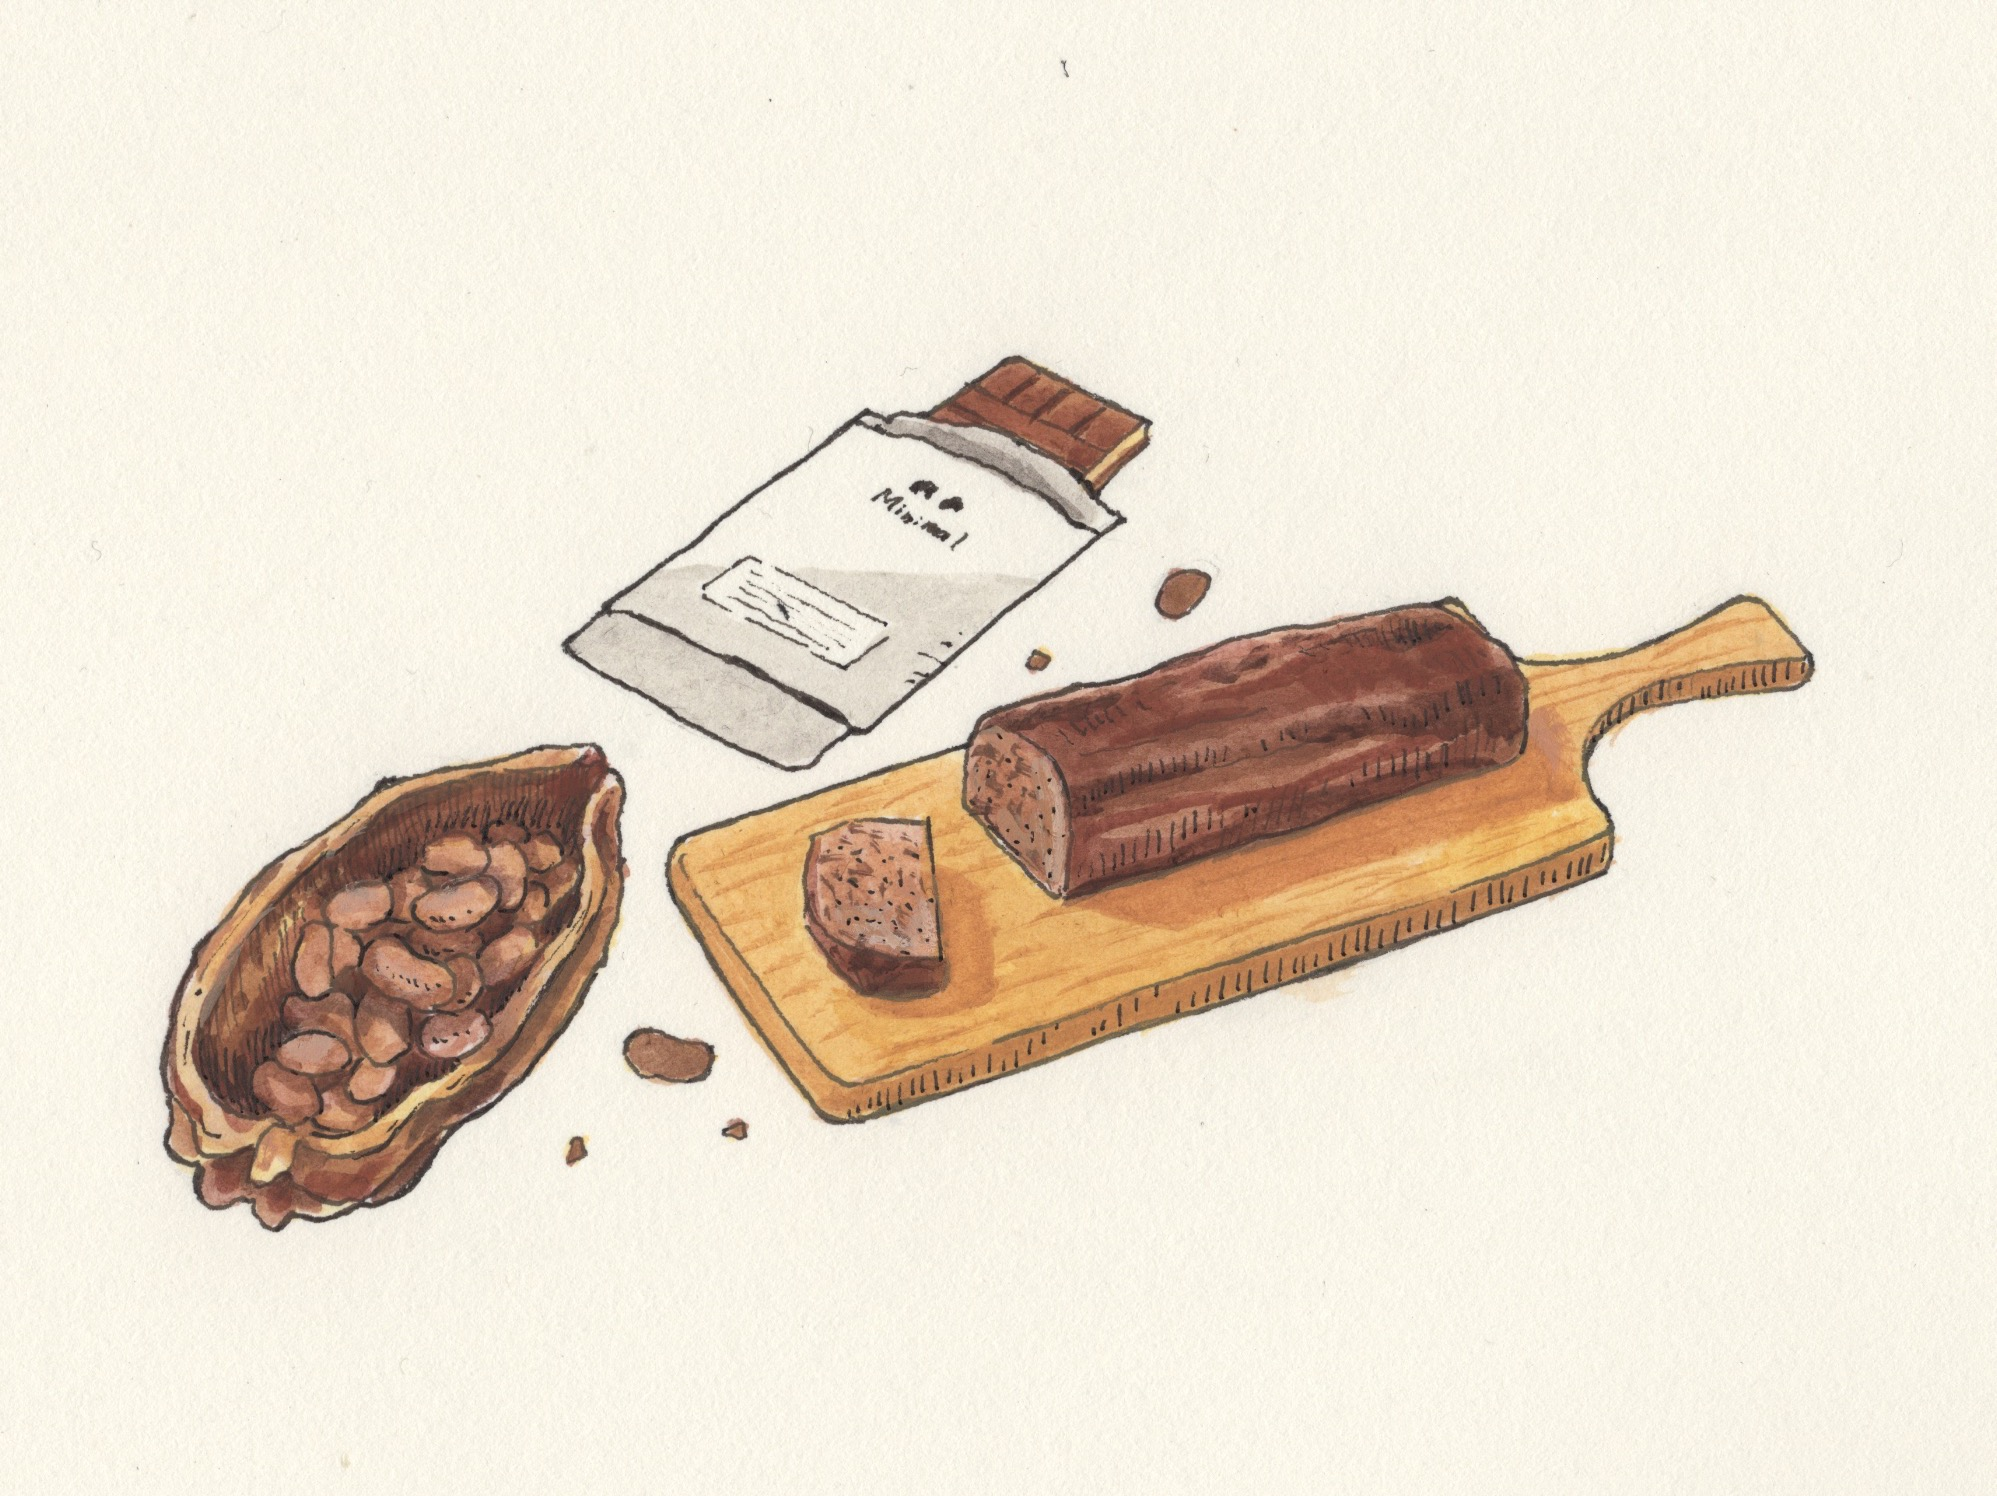 代々木上原、Minimal The Baking